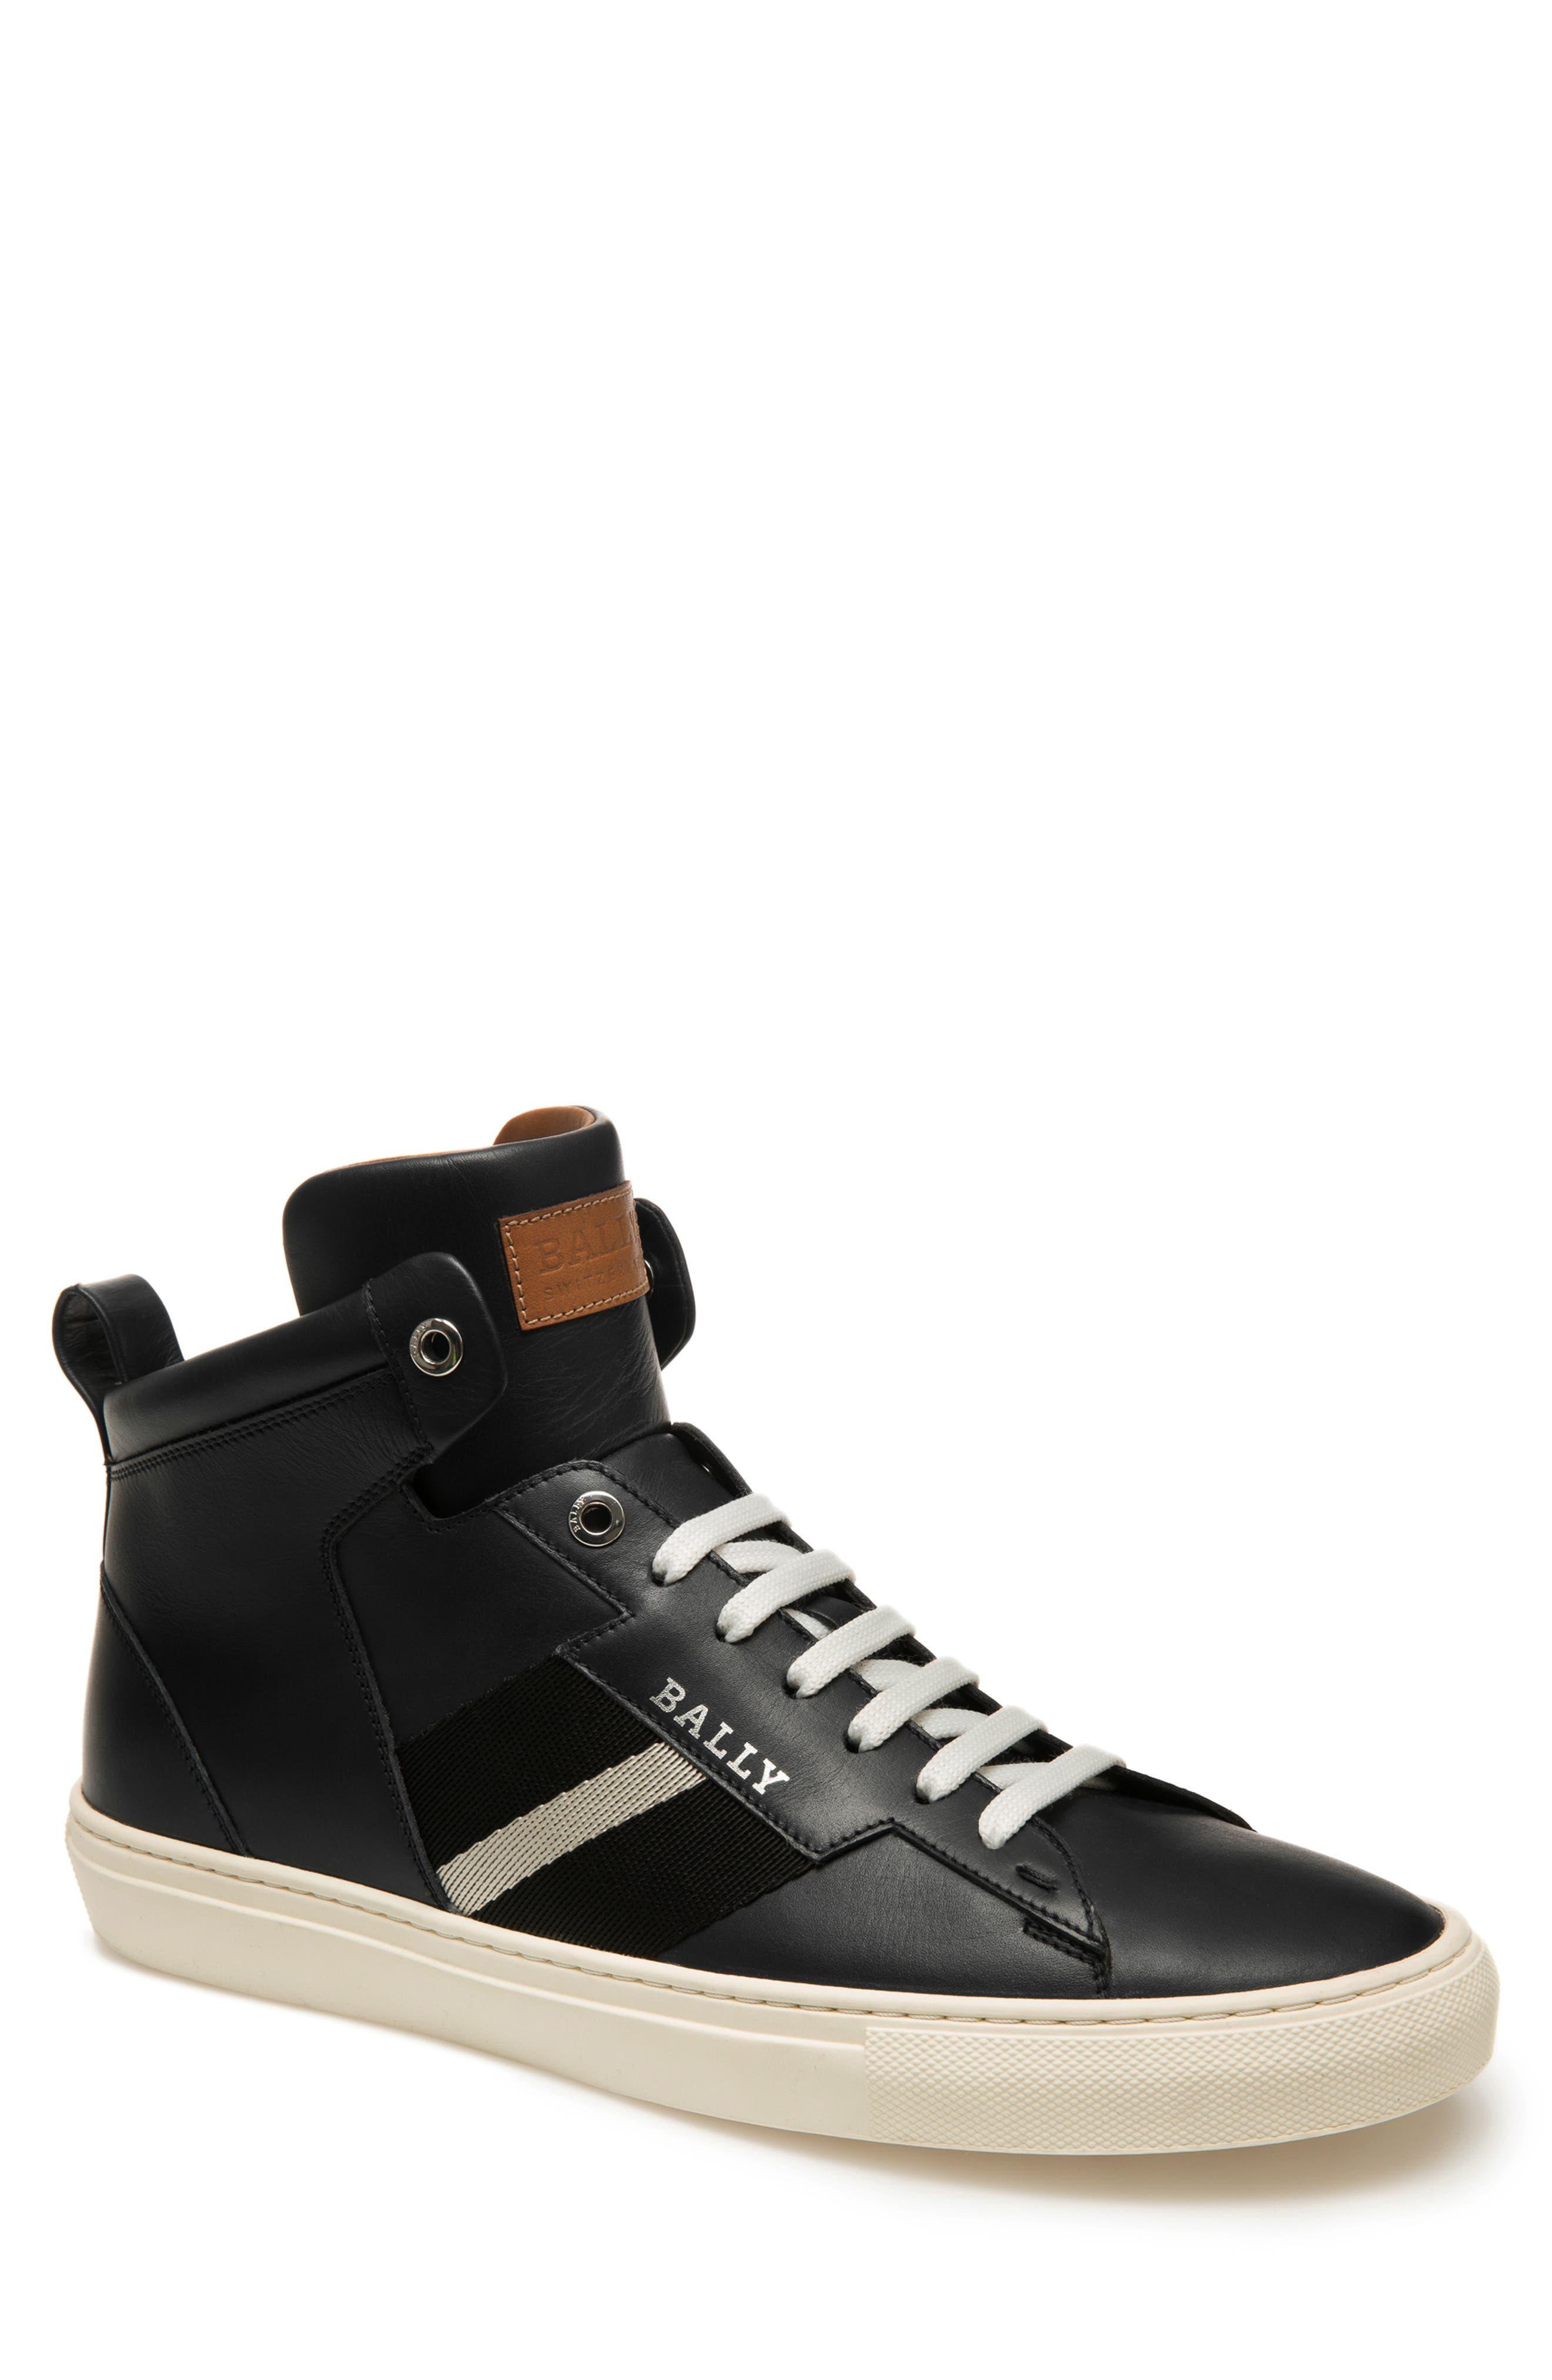 Bally Hedern Sneaker (Men) | Nordstrom